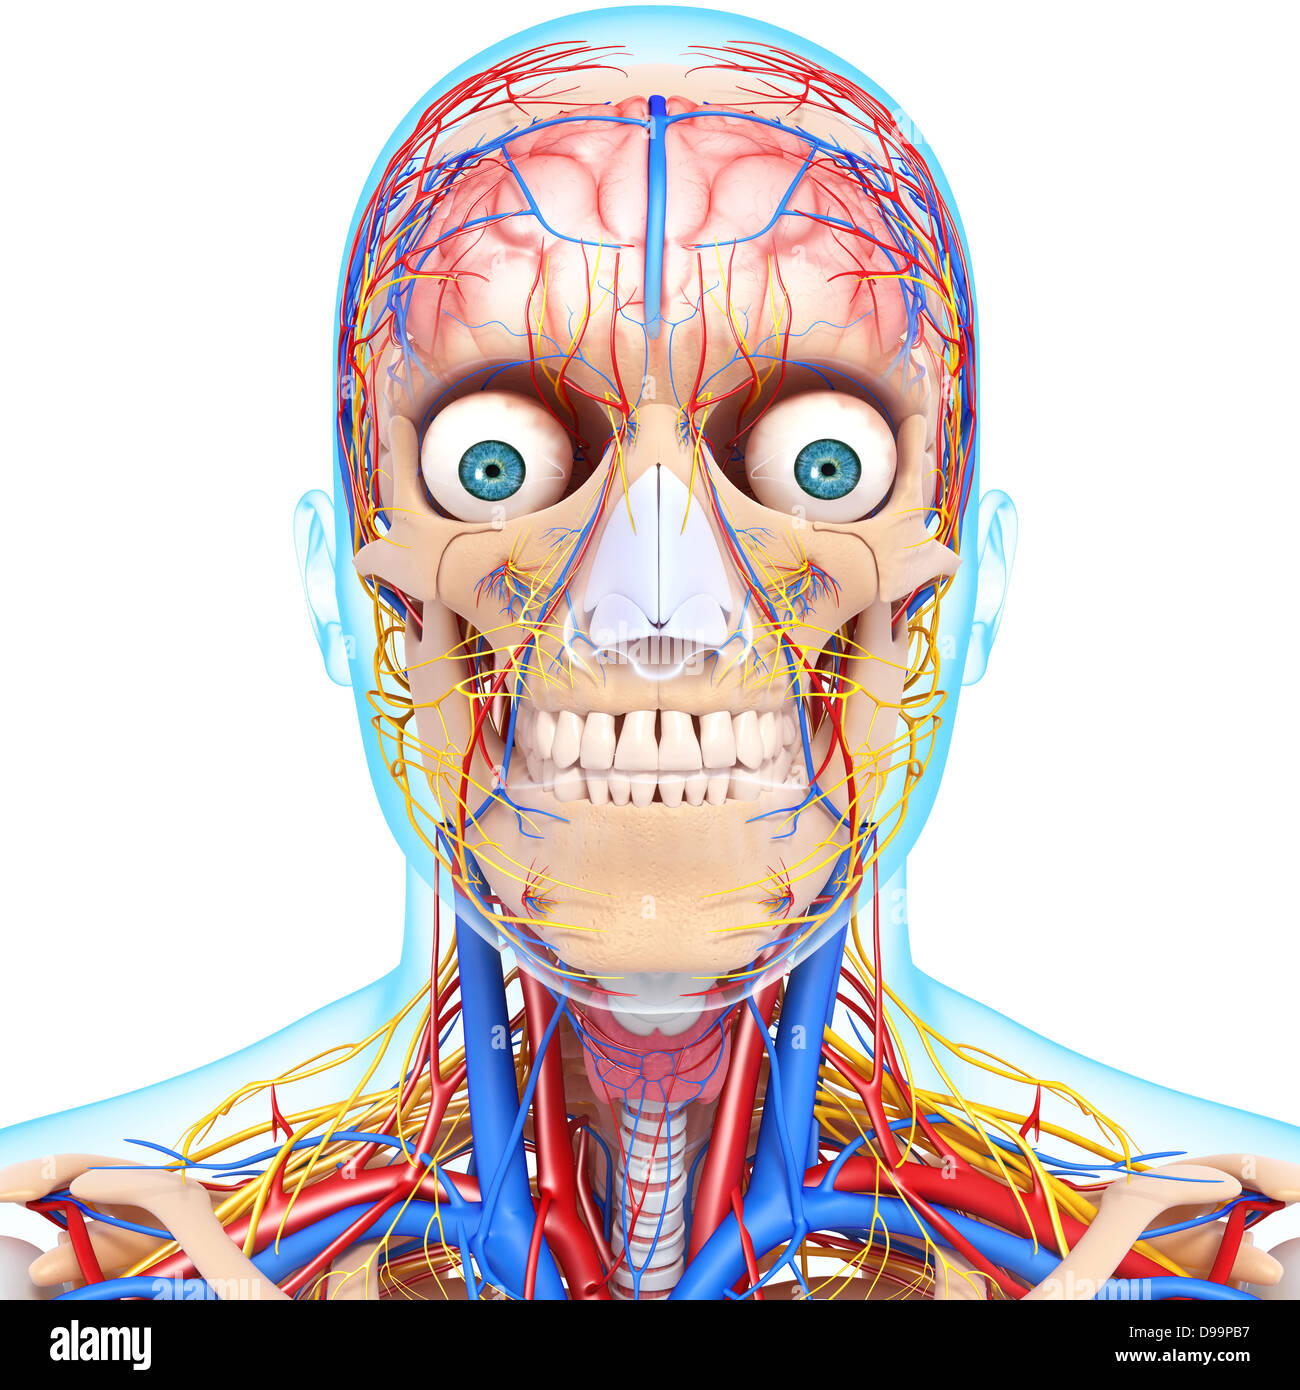 Circulatory System Of Human Head Anatomy Stock Photo 57378139 Alamy